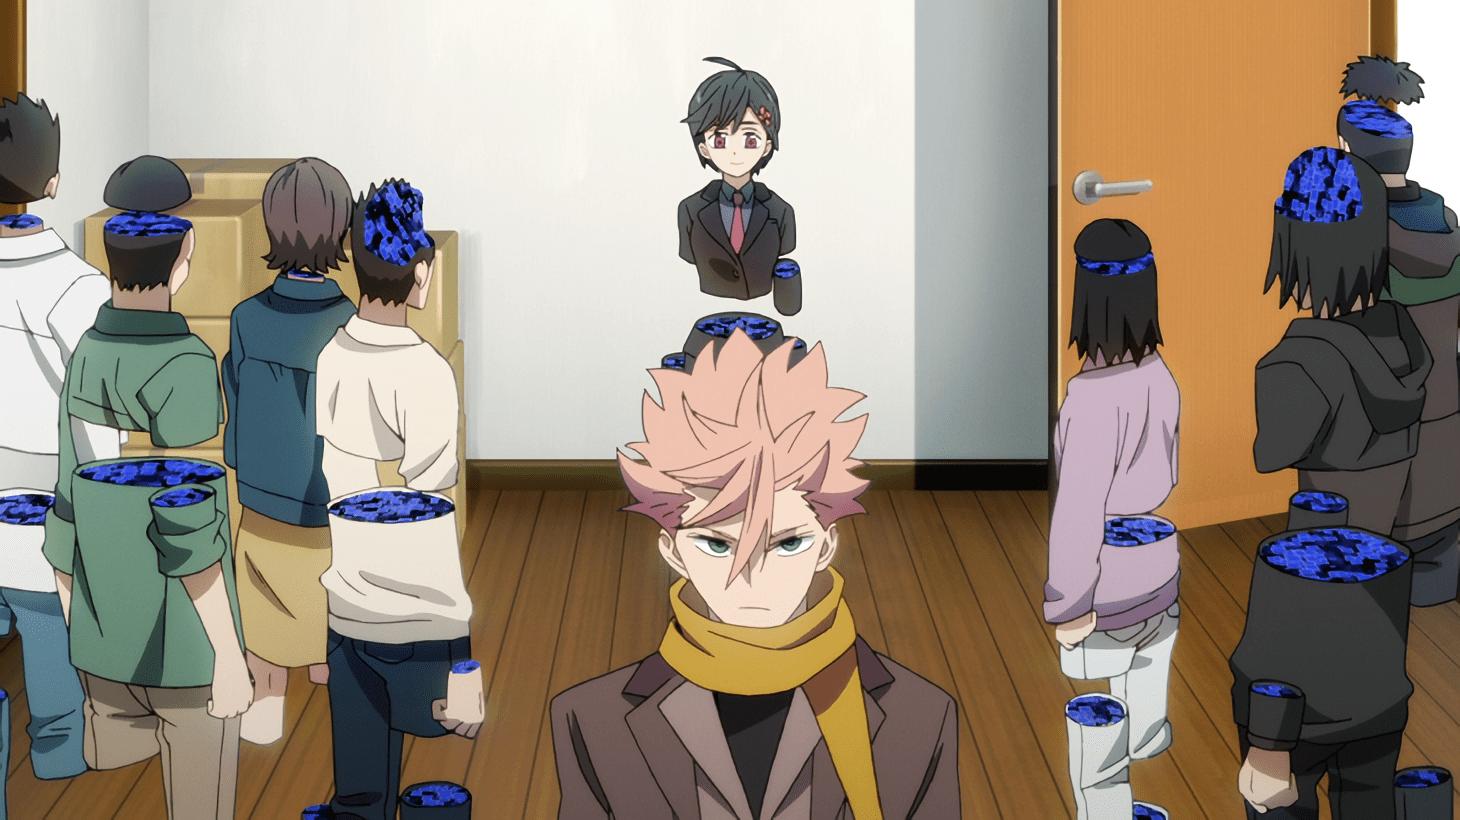 suspense anime similar to High-Rise Invasion